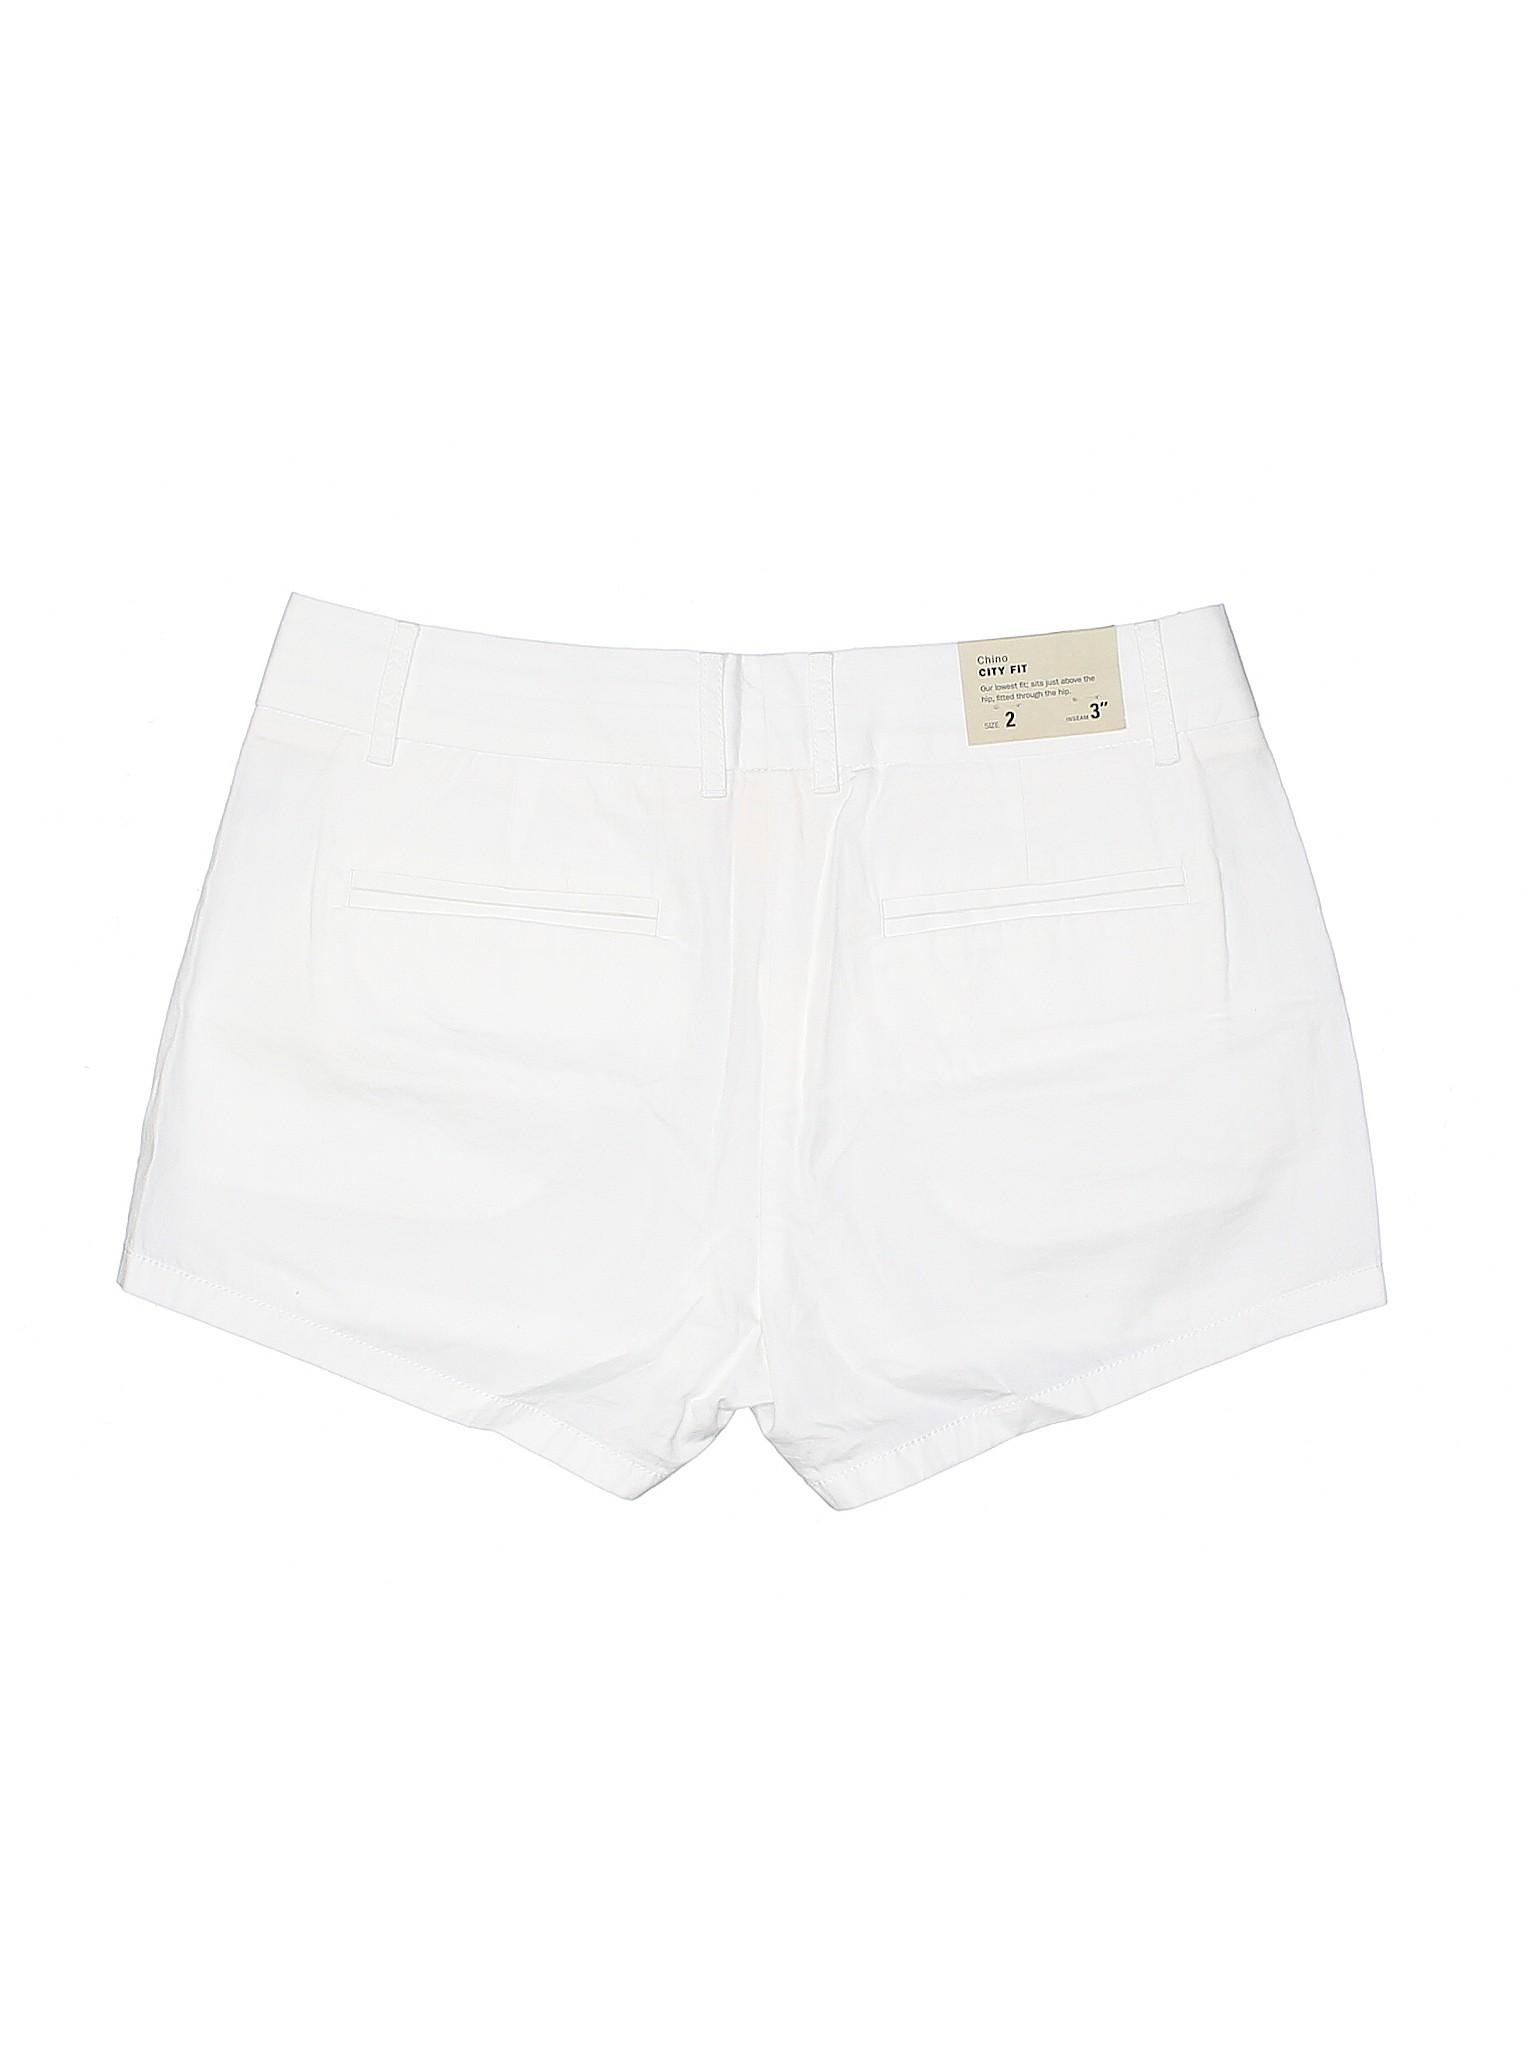 Crew Store J Shorts Factory Khaki Boutique aTH6xq55